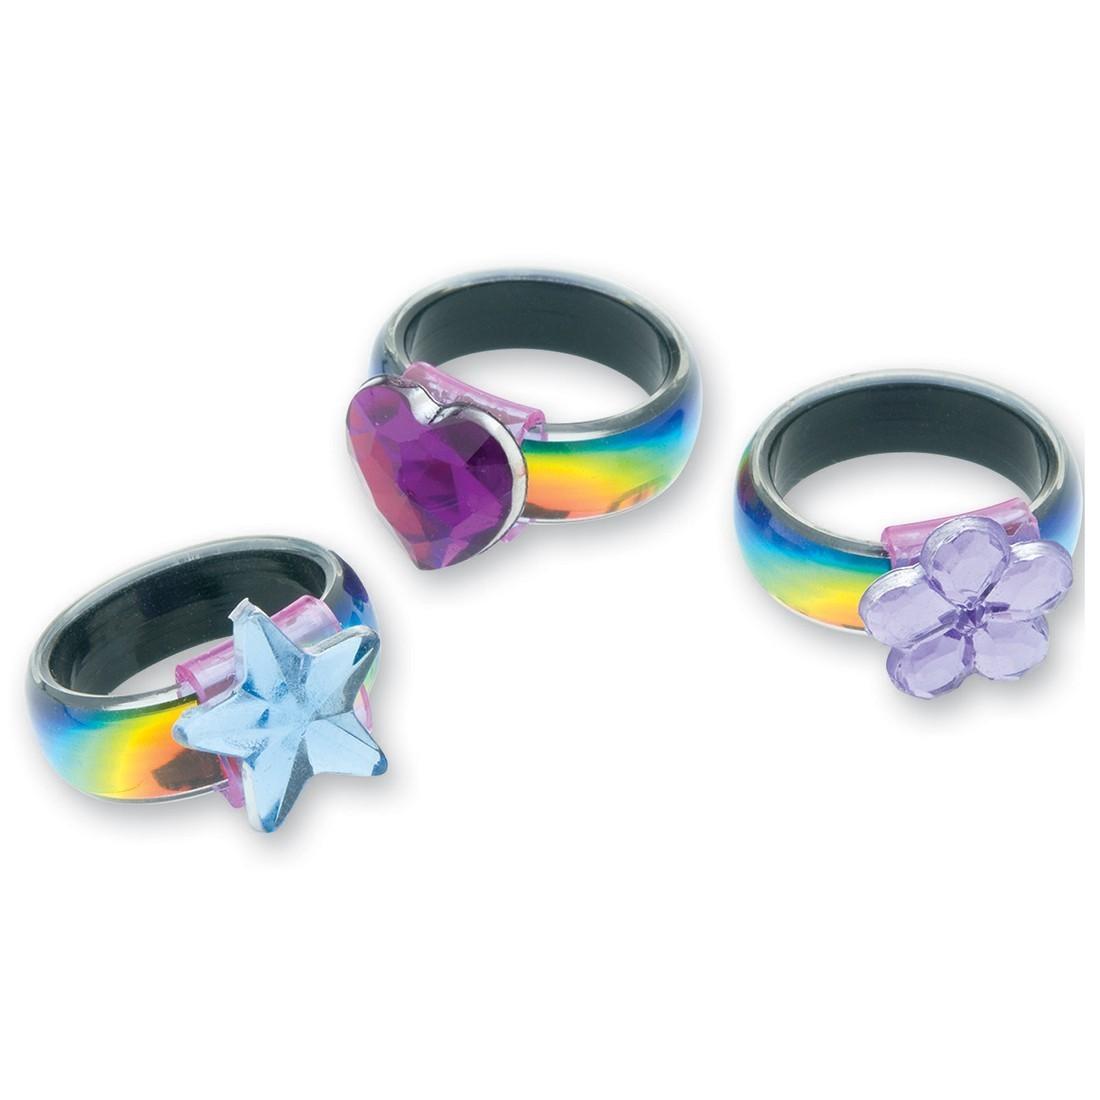 Rainbow Laser Rings [image]